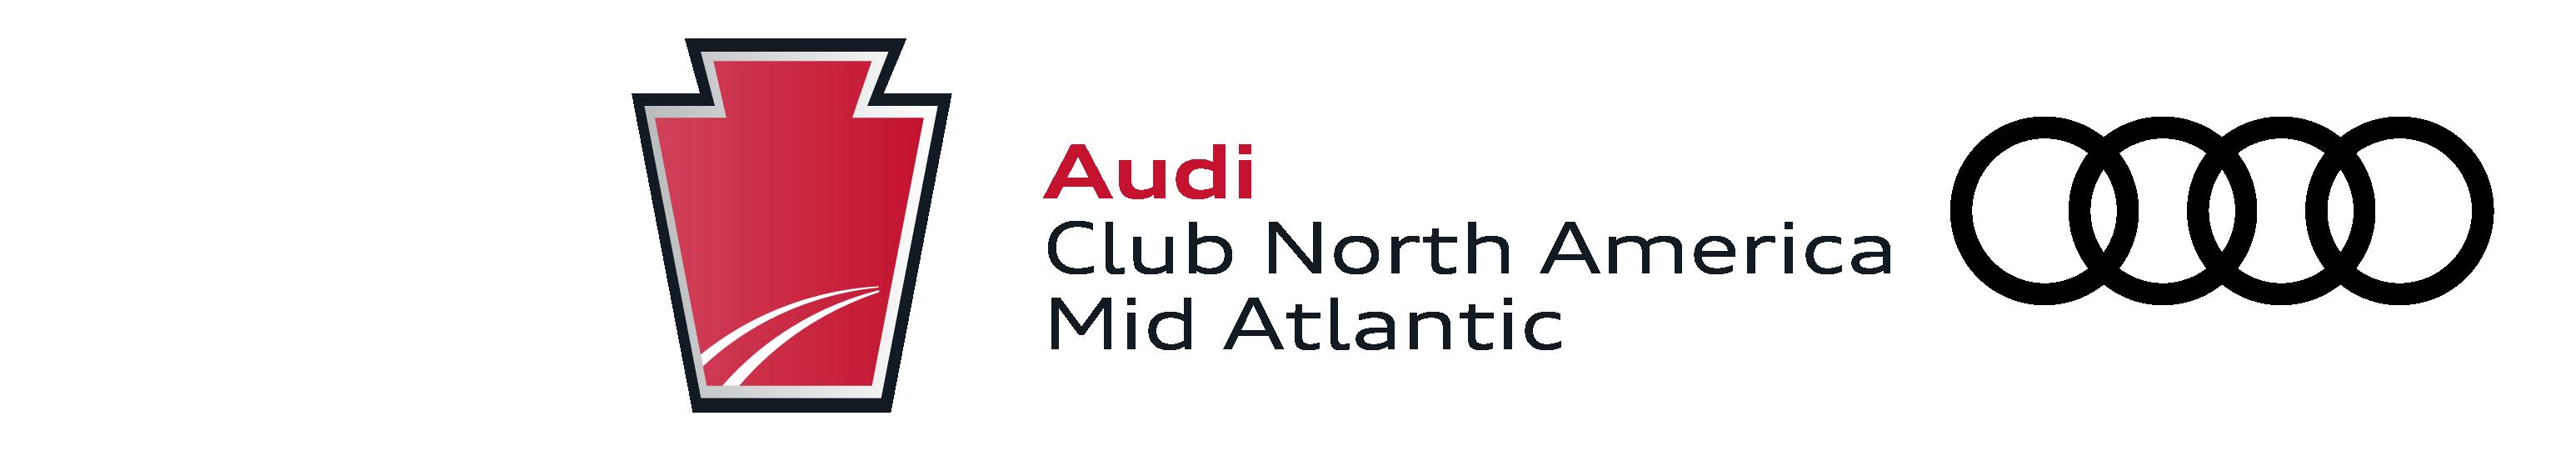 Mid Atlantic Chapter – Audi Club of North America